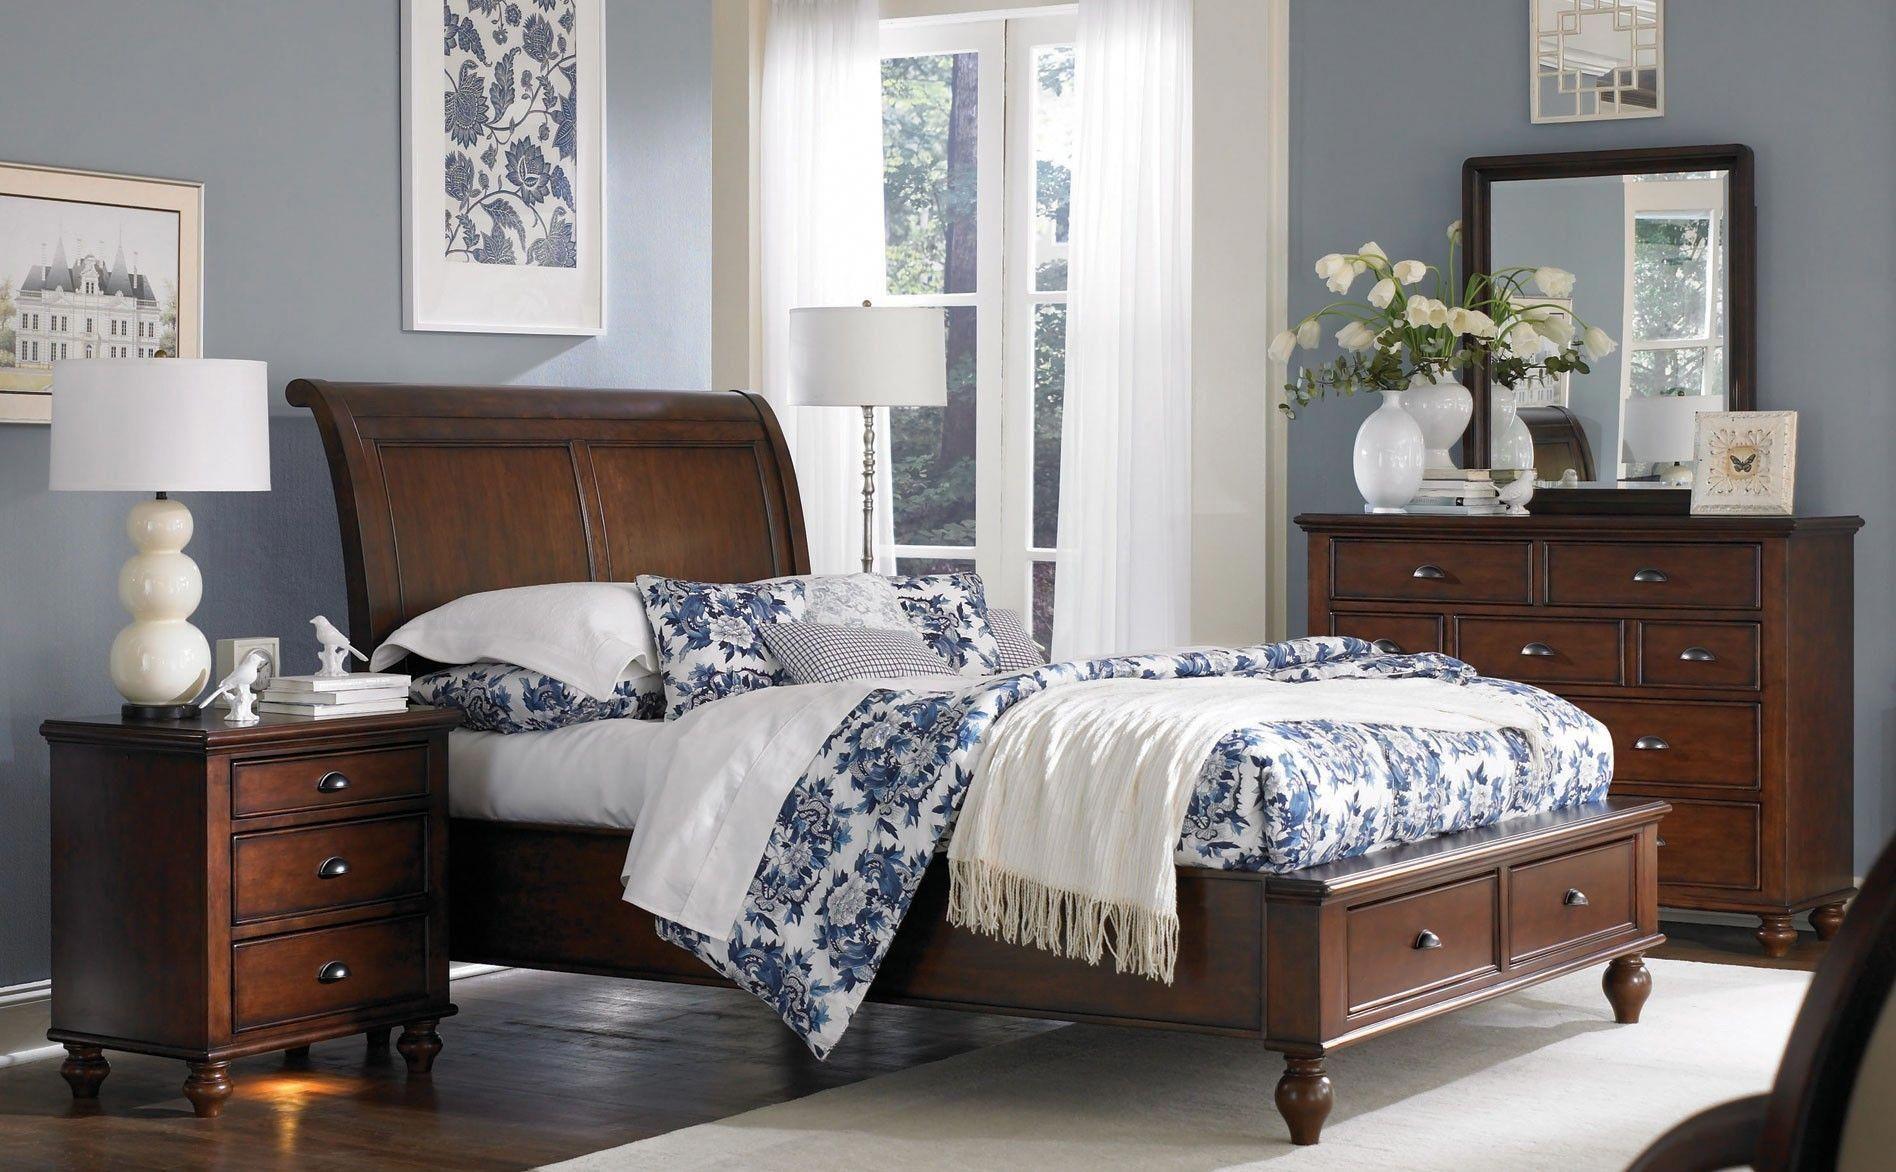 30 Inspiration Photo Of Bedroom Furniture Colors Bedroom Furniture Colors Master Bedroom Cherry Bedroom Furniture Mahogany Bedroom Furniture Cherry Furniture